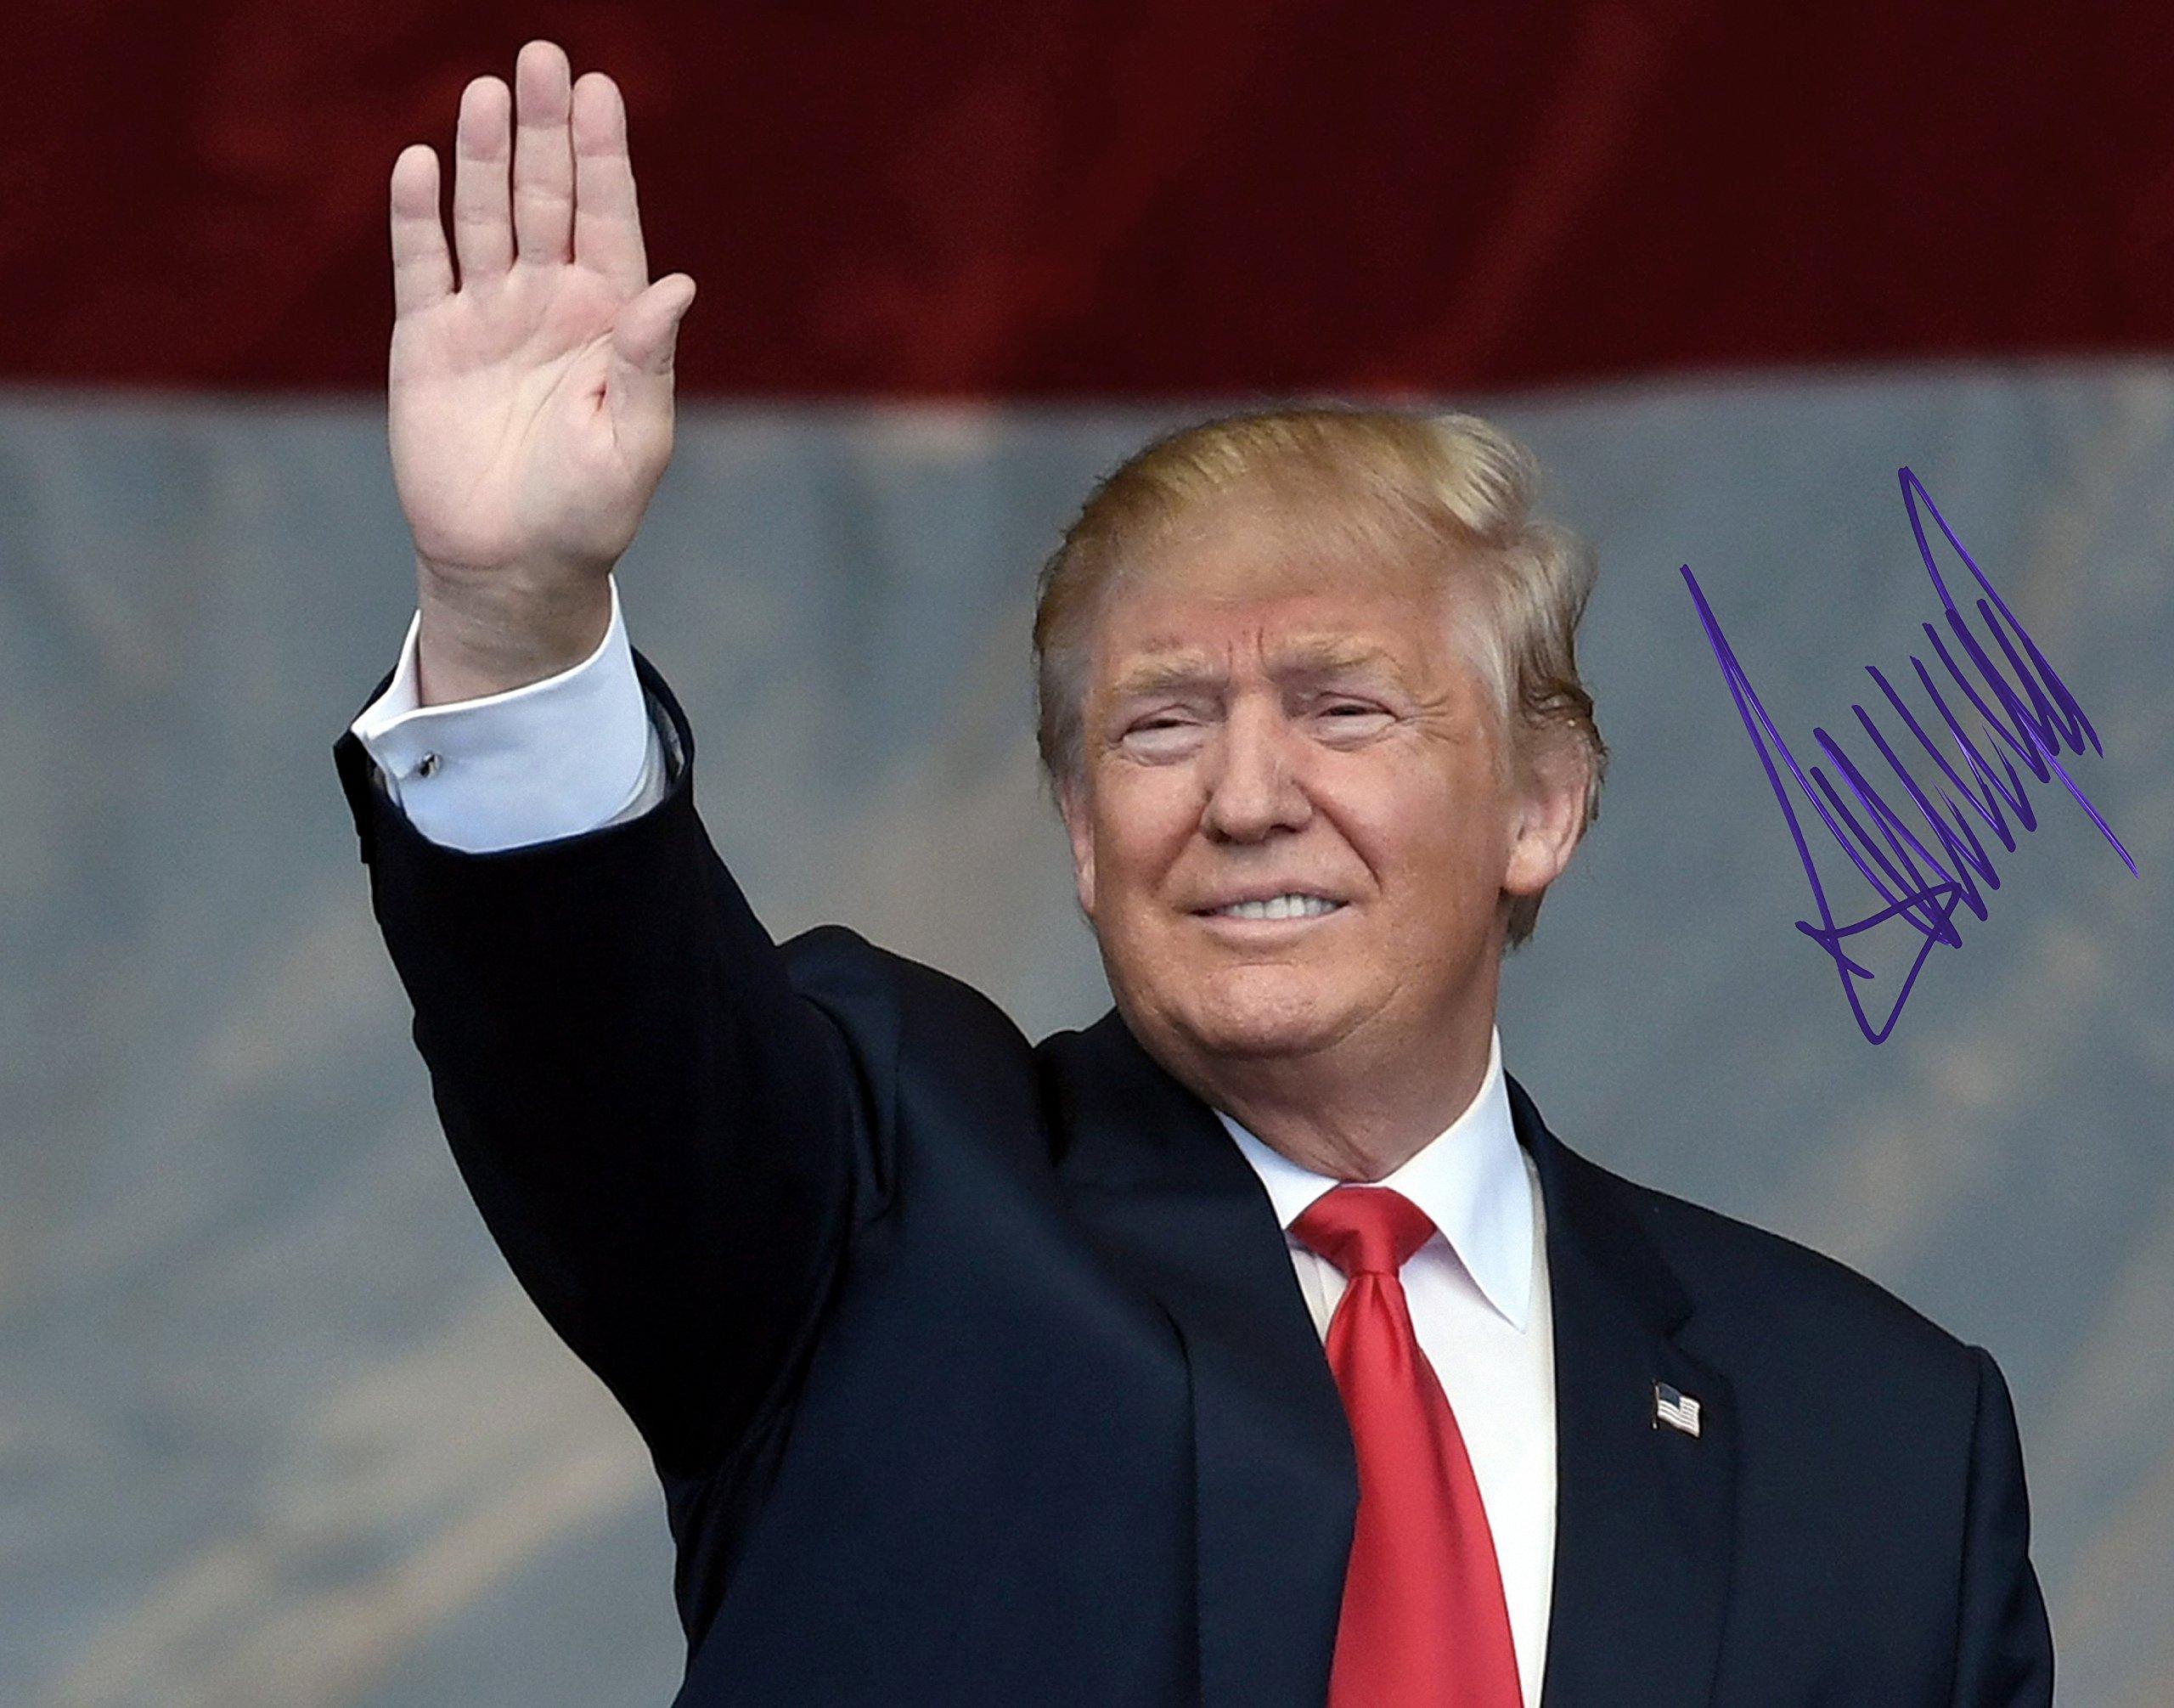 Donald Trump and Autographed Preprint